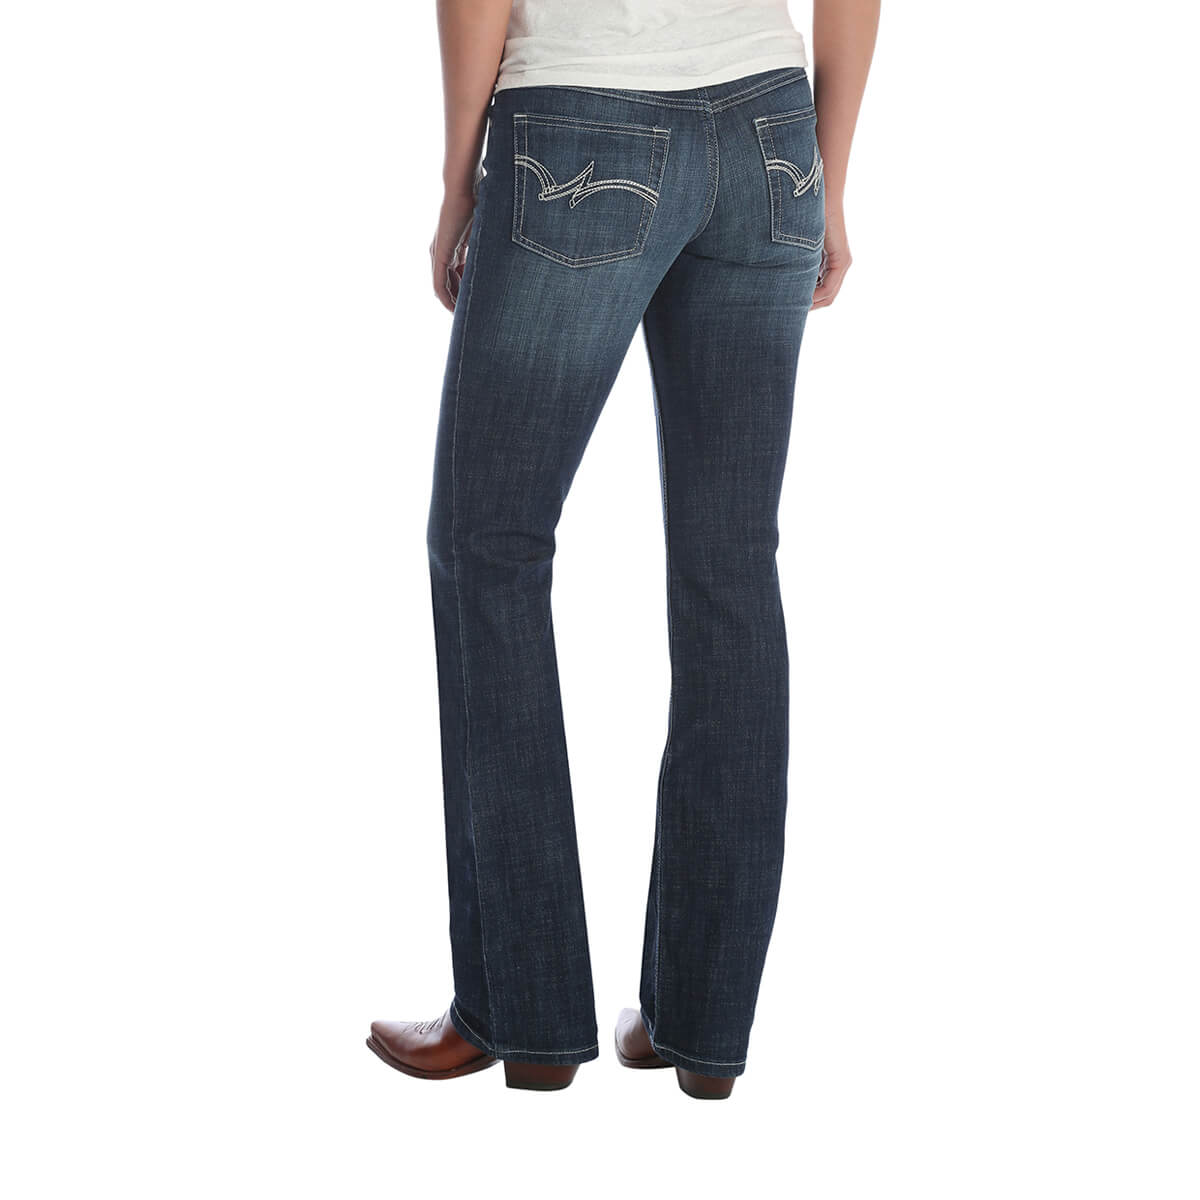 Women's Wranglers Dark Wash Boot Cut Jeans